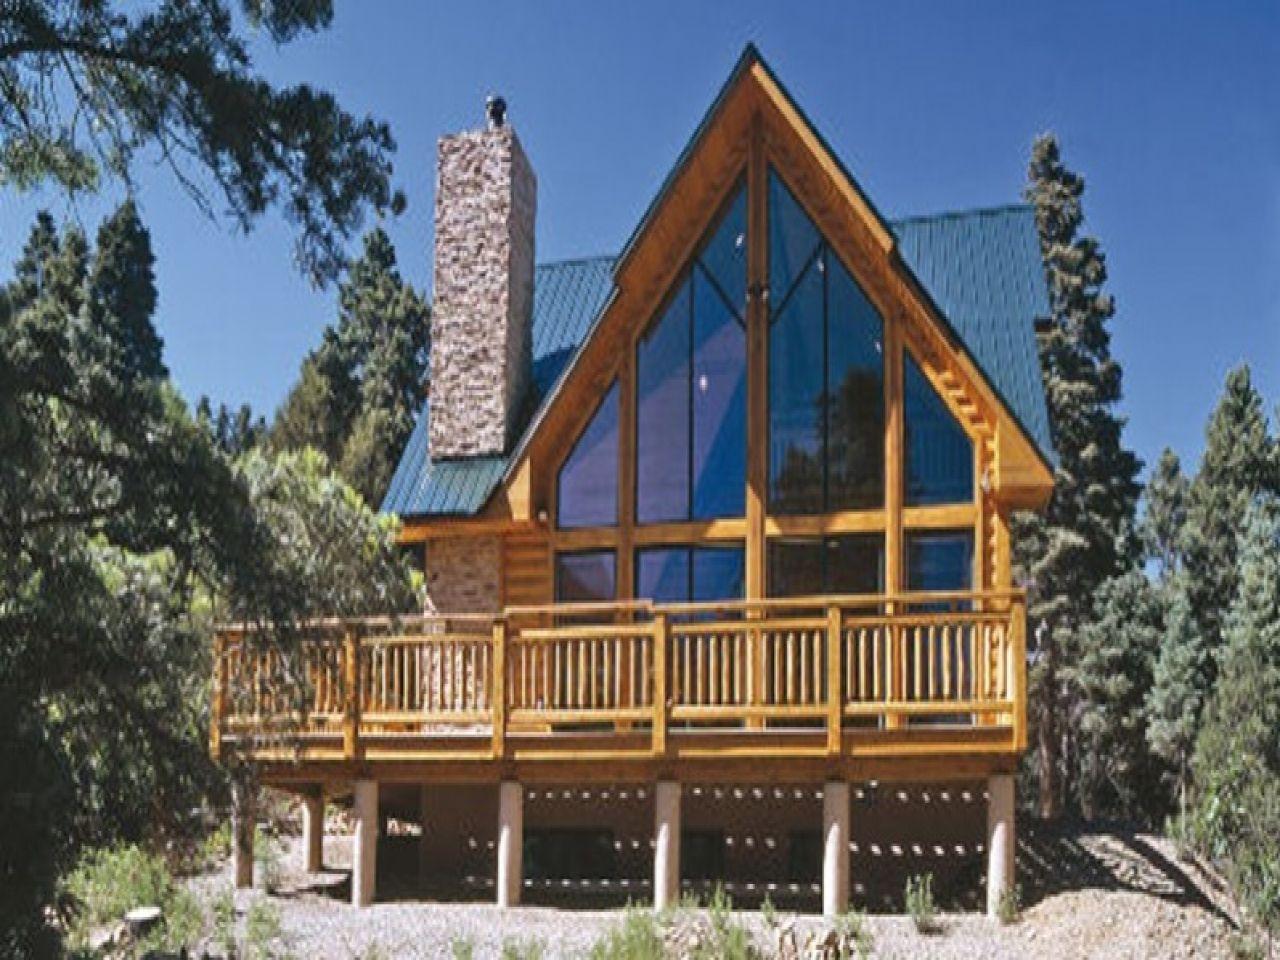 Frame Log Cabin House Plans Architecture - Chalets &